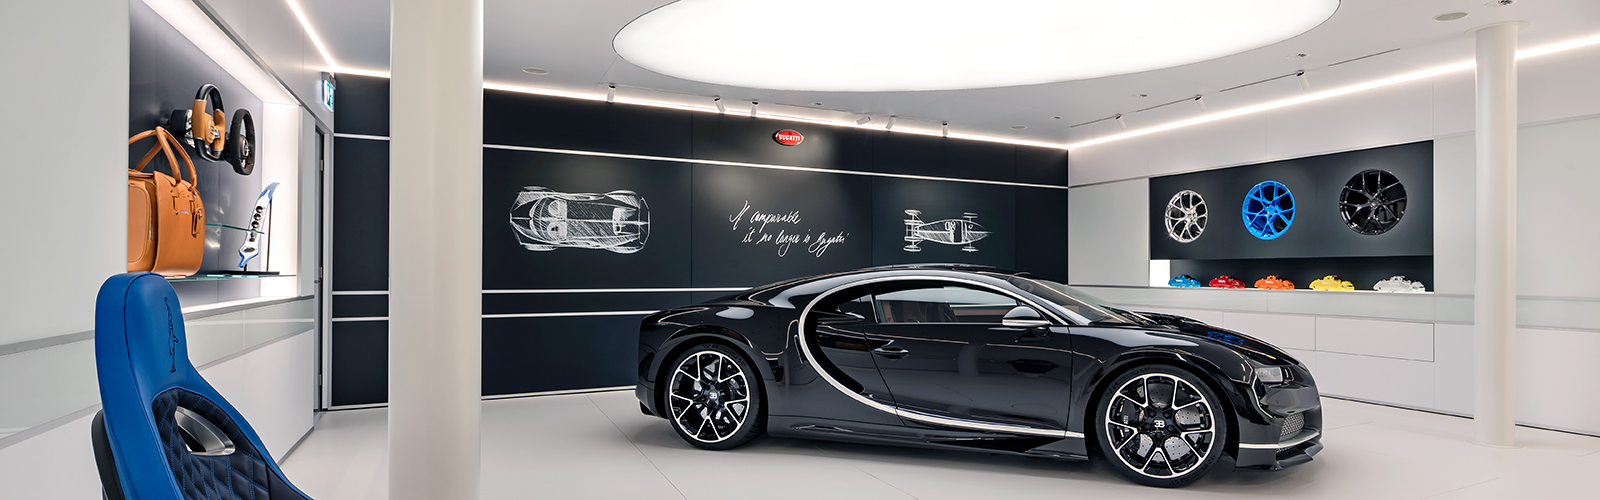 Braunwagner Bugatti Geneva Motorshow Design 2019